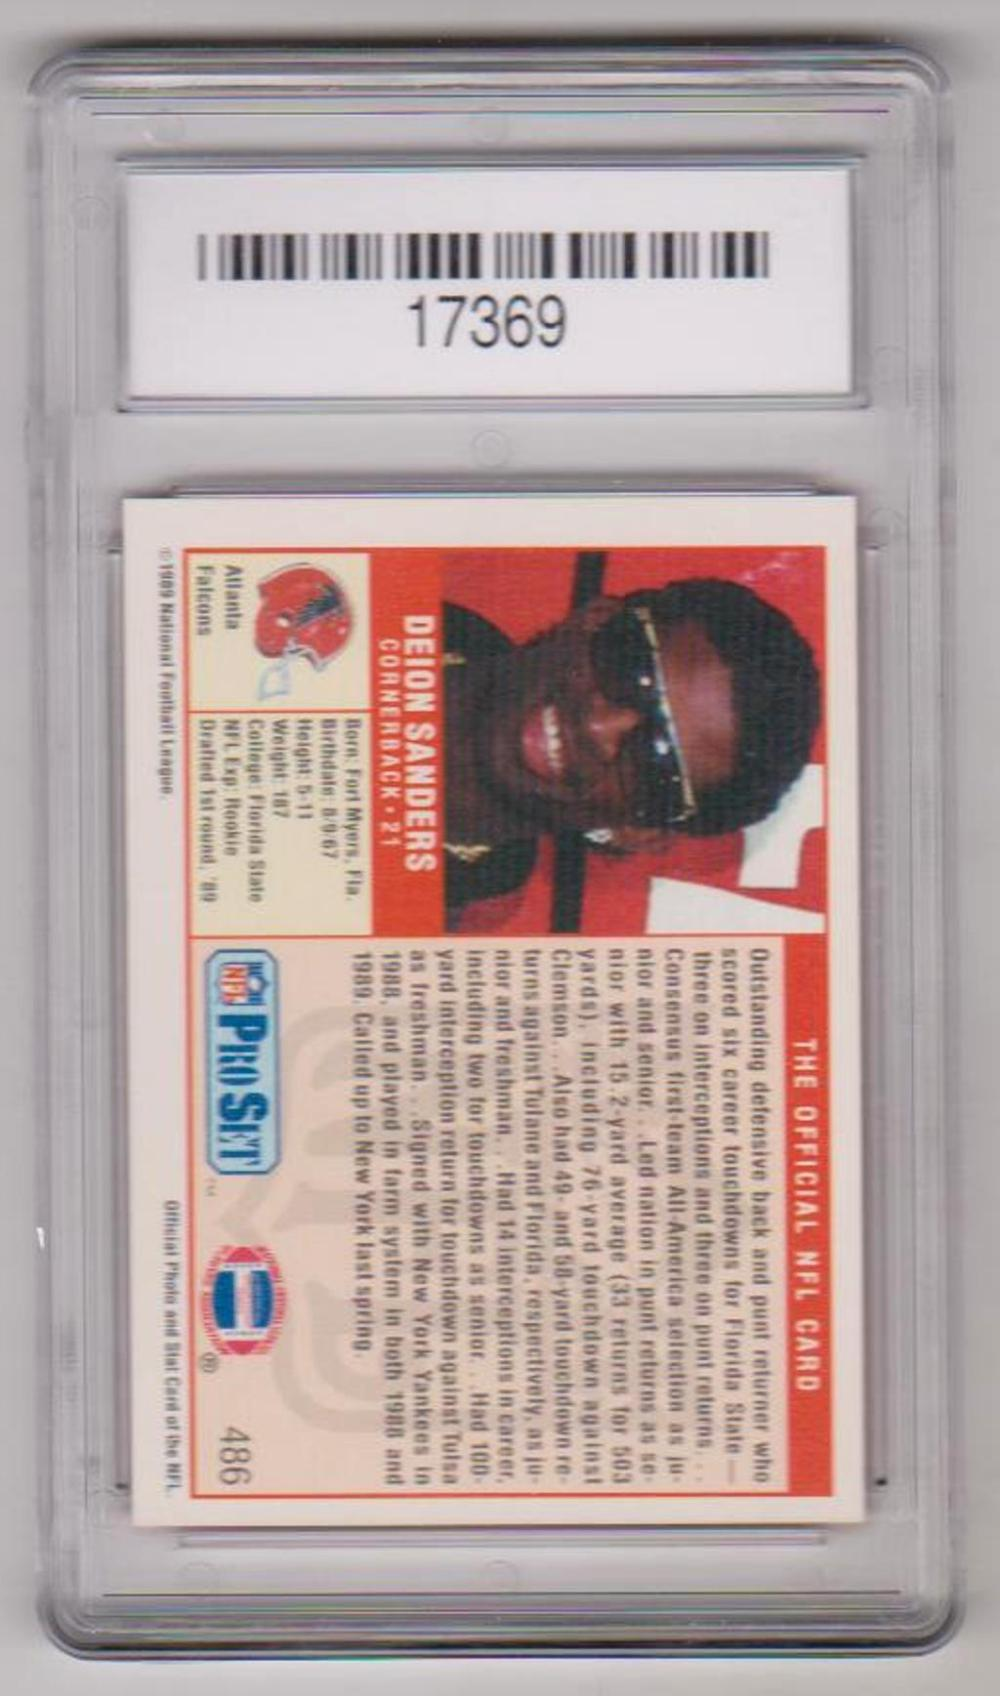 Rookie Graded Gem Mint 10 Deion Sanders 1989 Pro Set 486 Ca